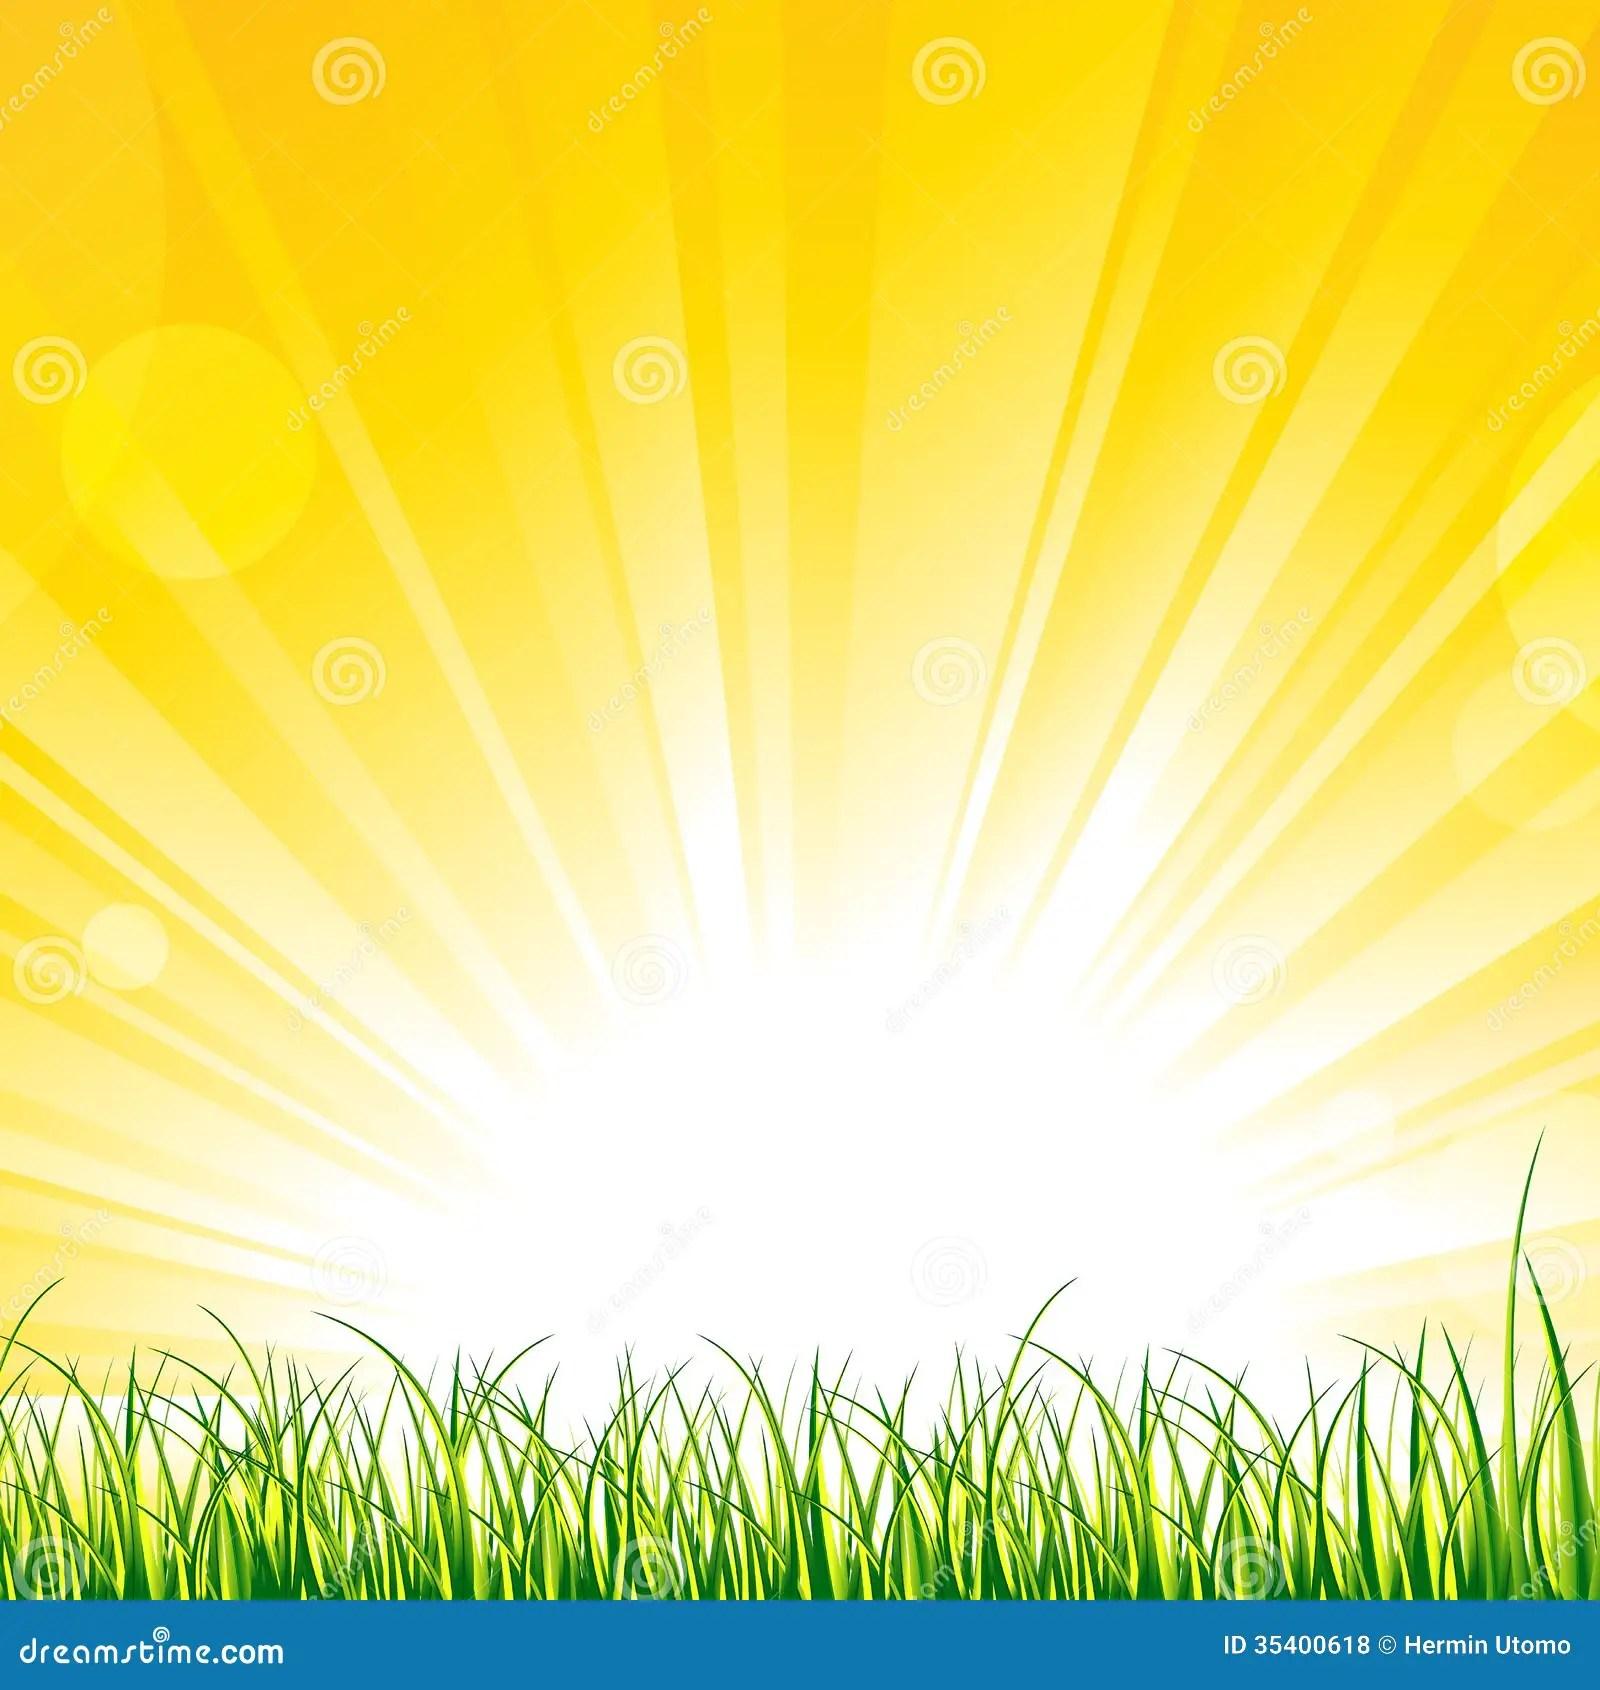 hight resolution of grass on the sunshine rays